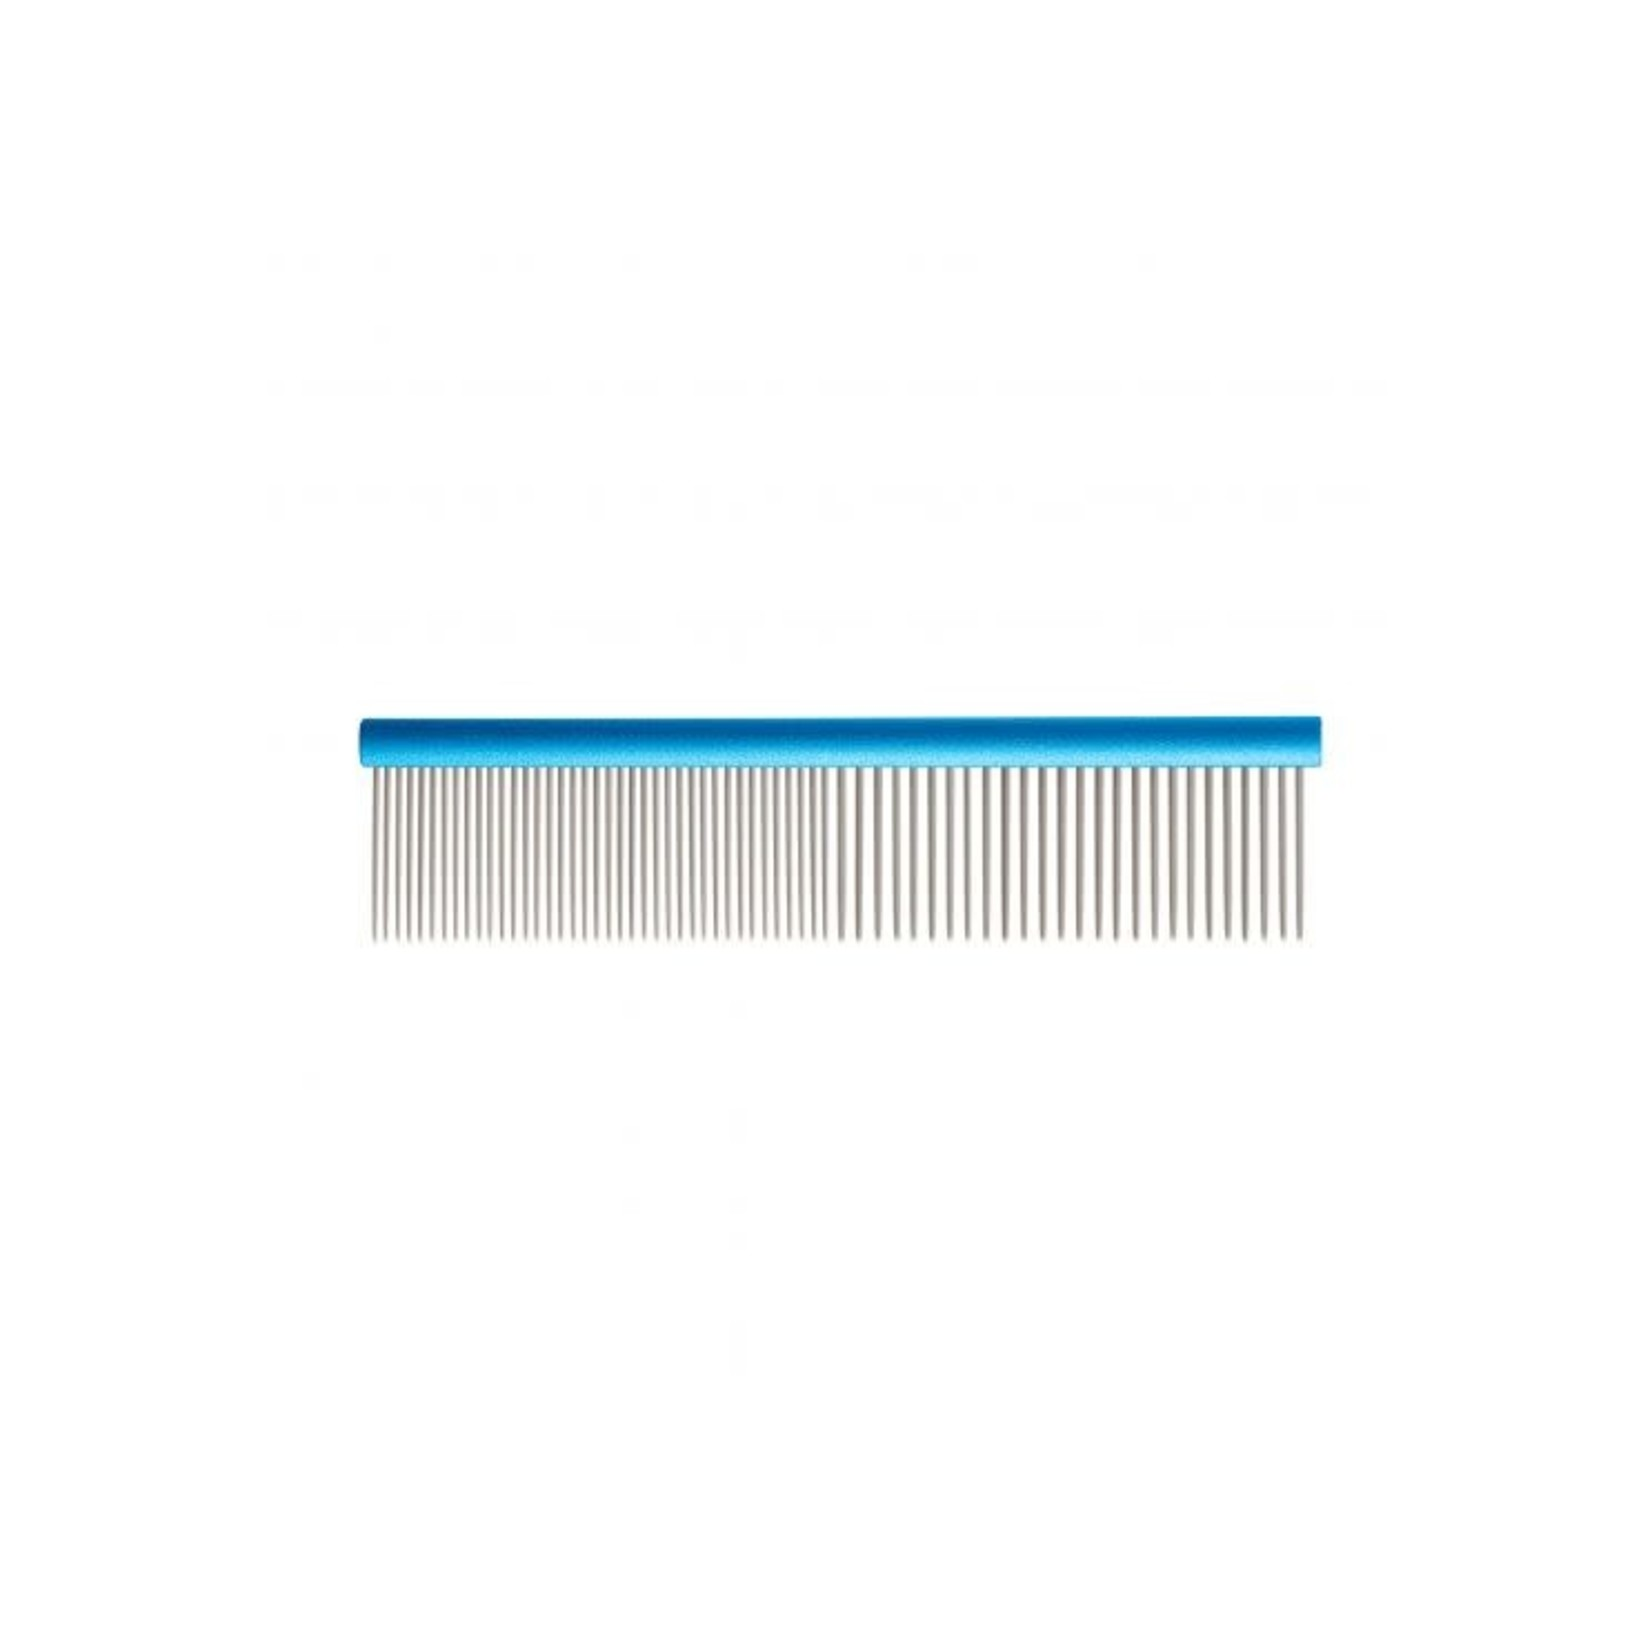 Ancol Ergo Aluminium Comb with 2 teeth widths, 19cm